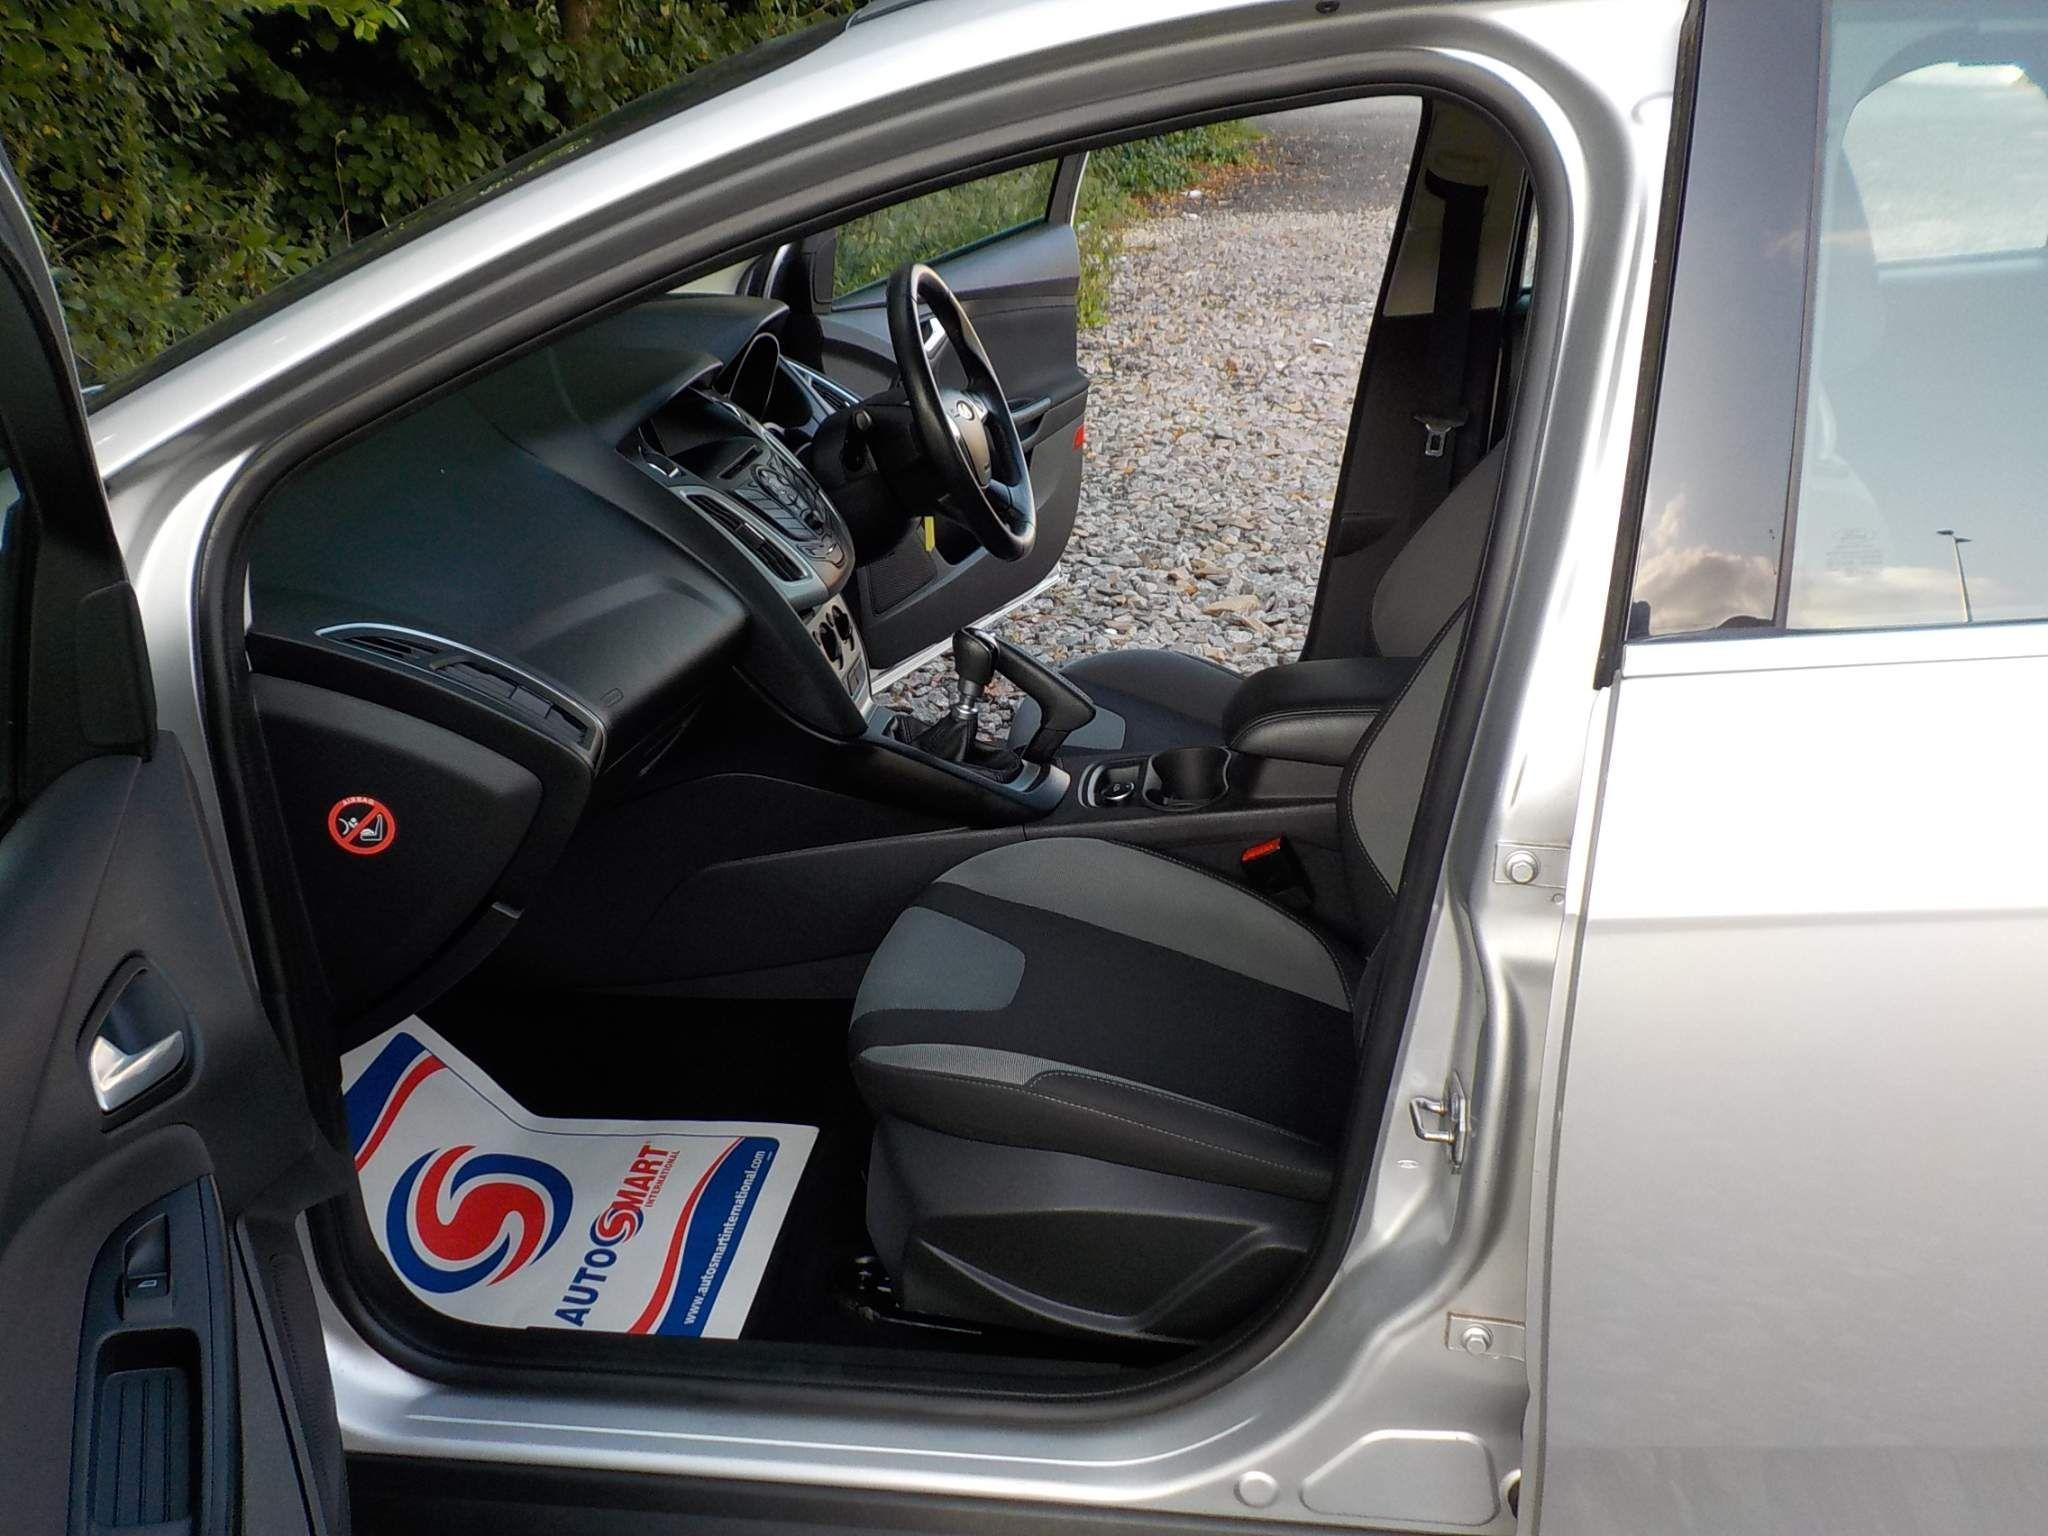 Ford Focus 1.6 TDCi Zetec Navigator Navigator (s/s) 5dr